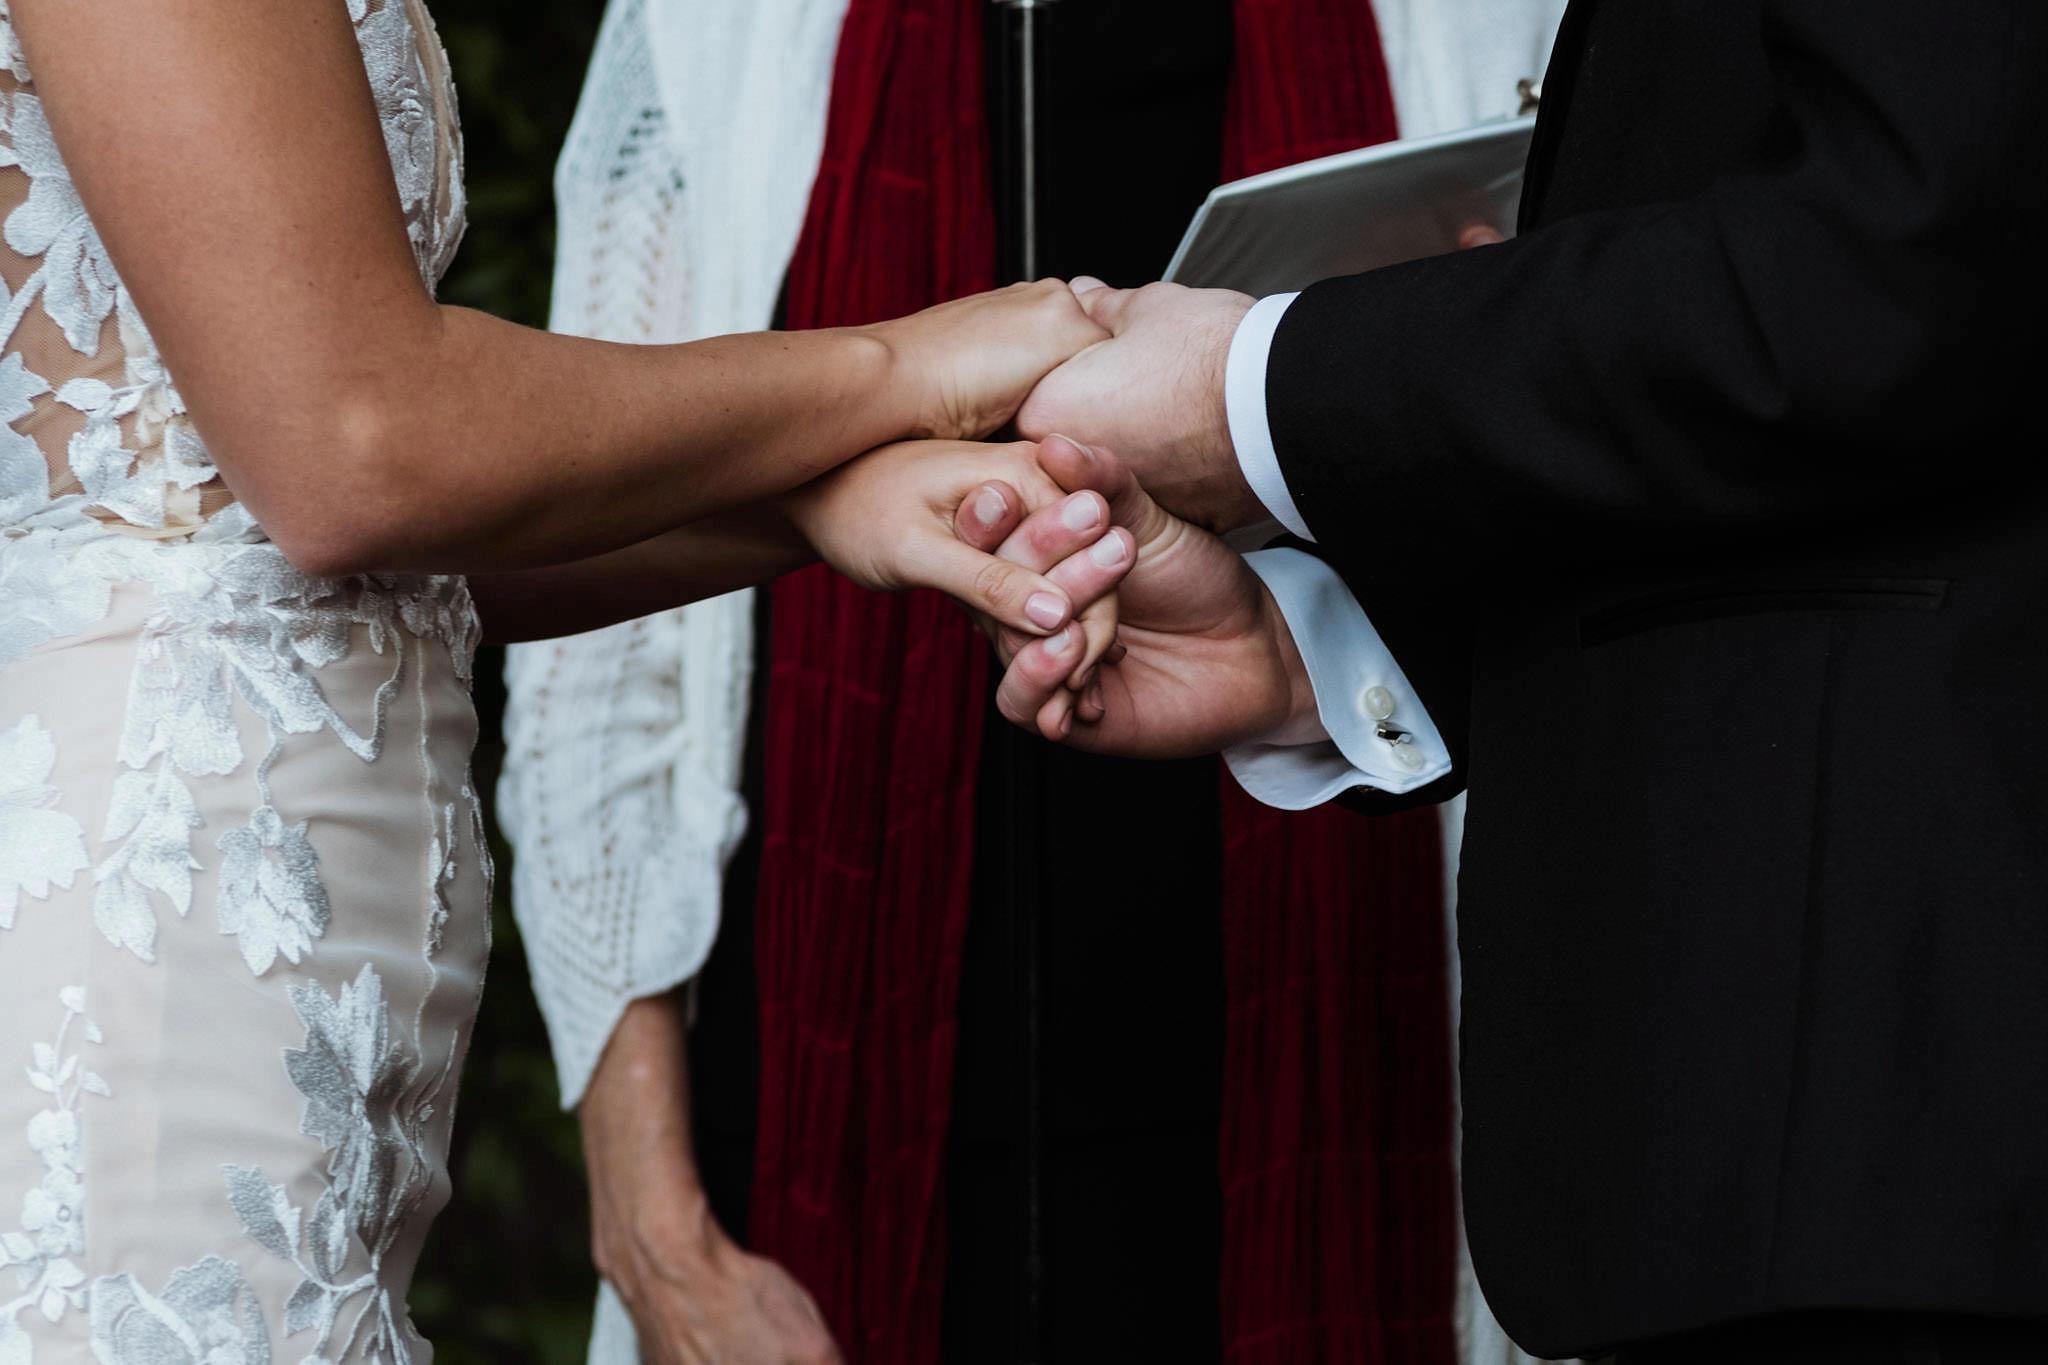 Feast of Fancy-Hobbs Building Wedding_Cinder Block Brewery Wedding_Kindling Wedding Photography_07.JPG